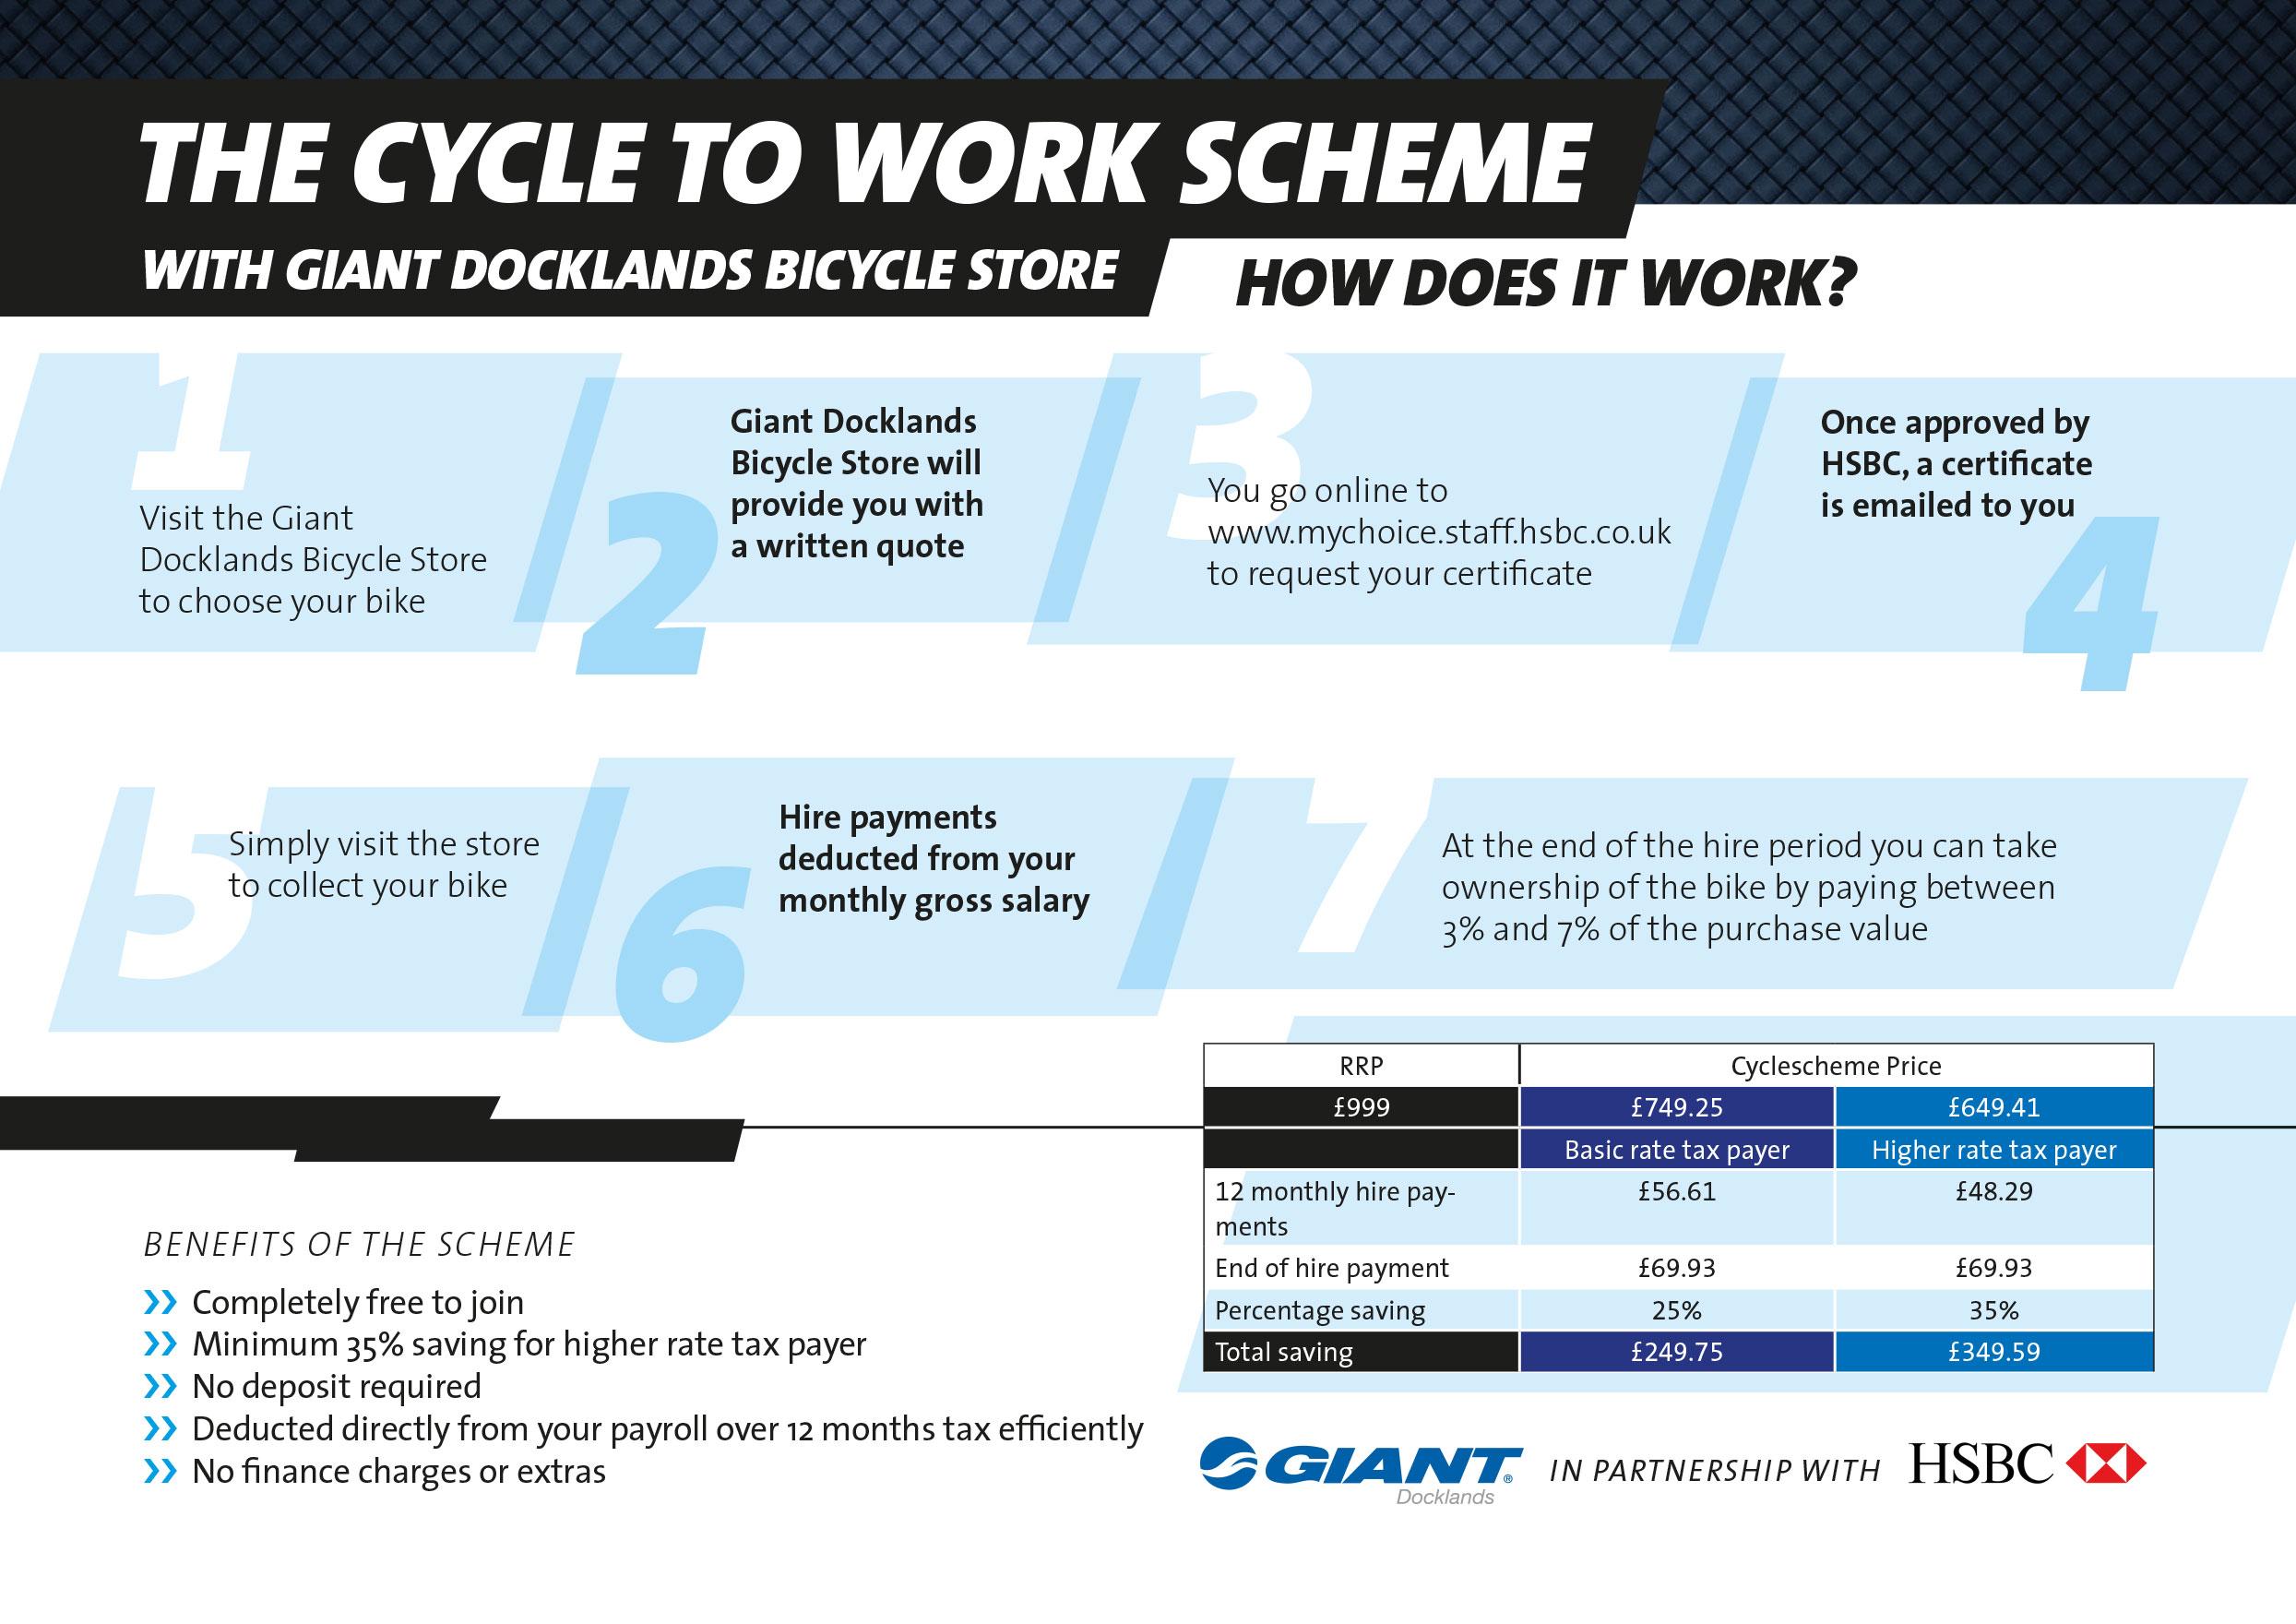 giantcyclescheme2